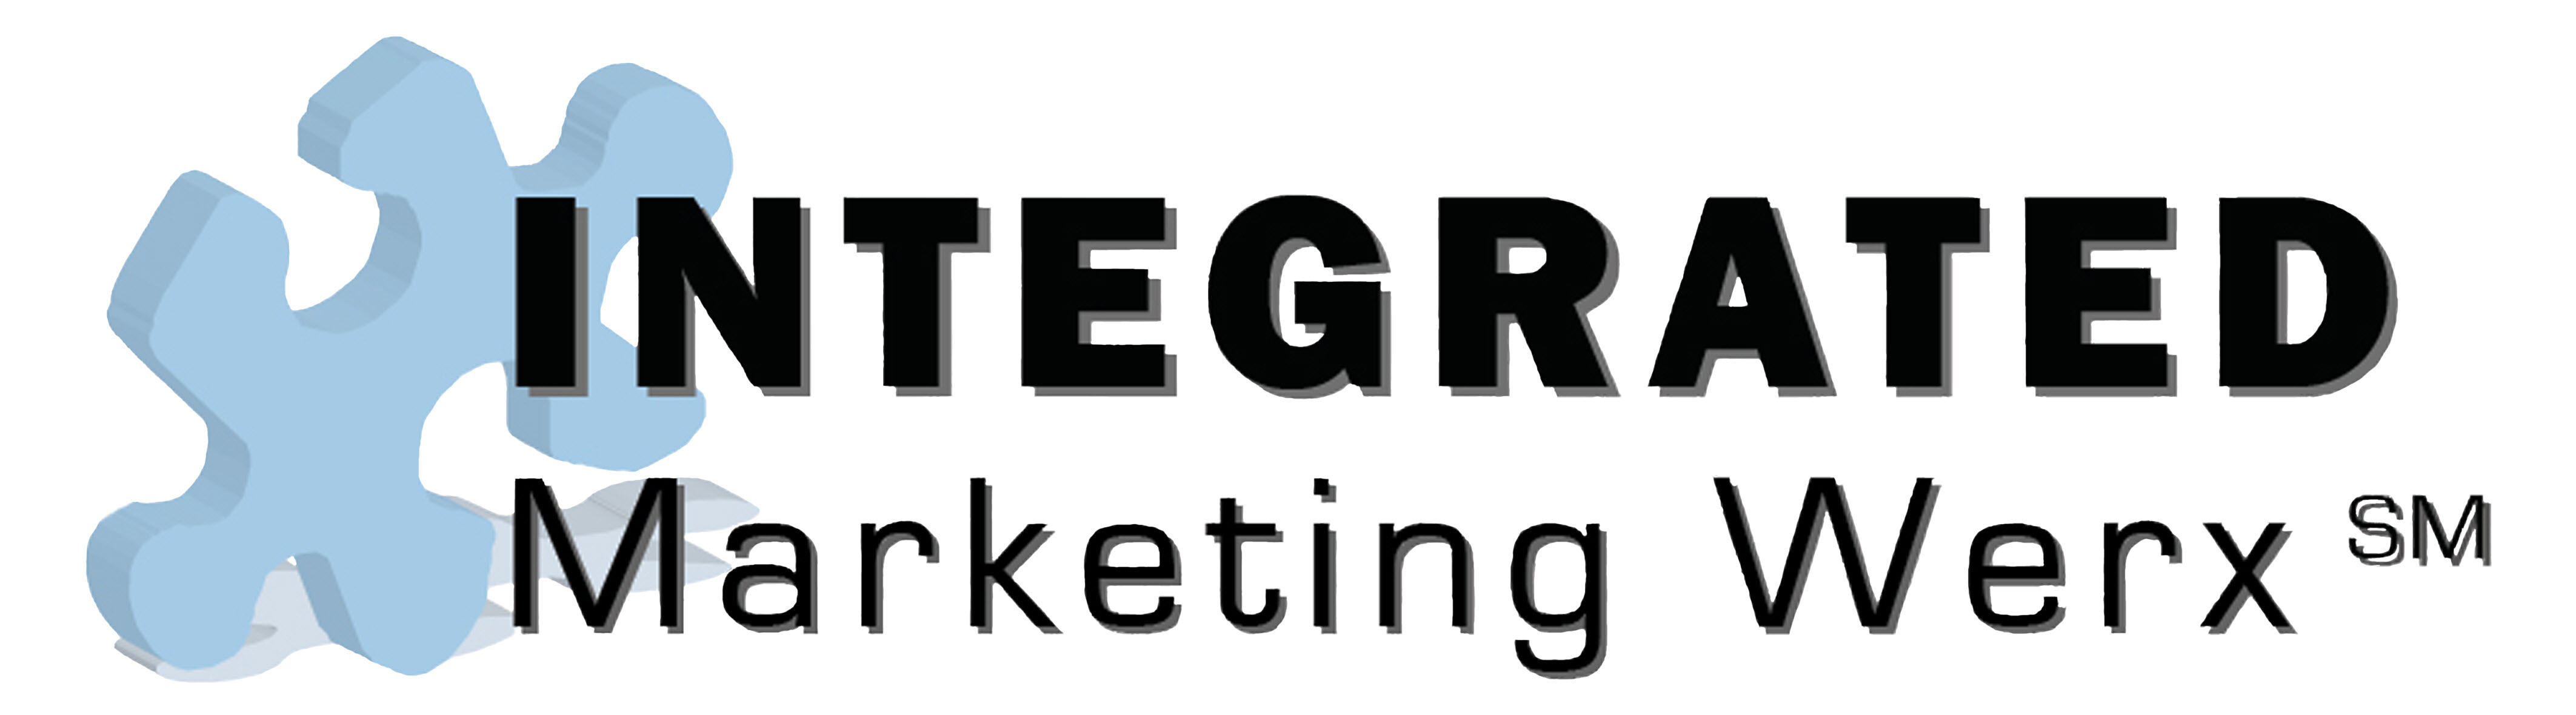 Integrated Marketing Werx